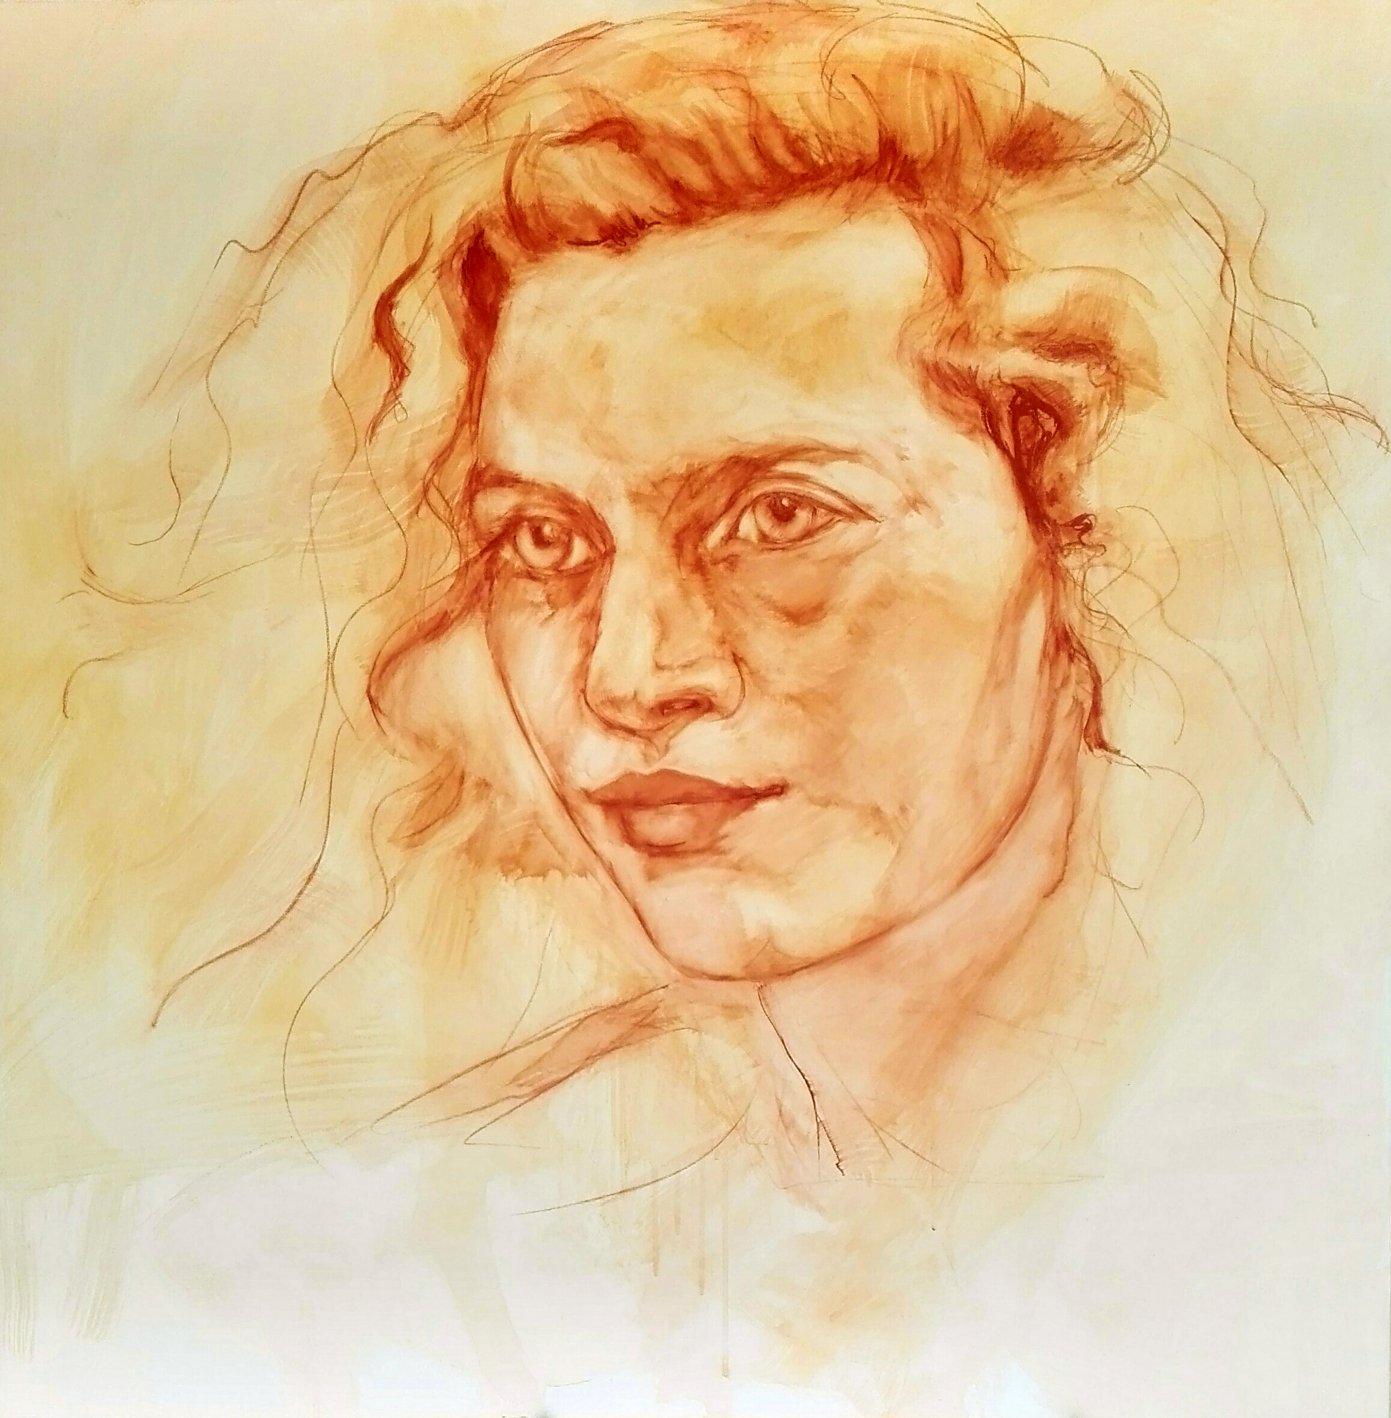 Retrato de Ahed Tamimi (2019) - Sofia G. Ruiz